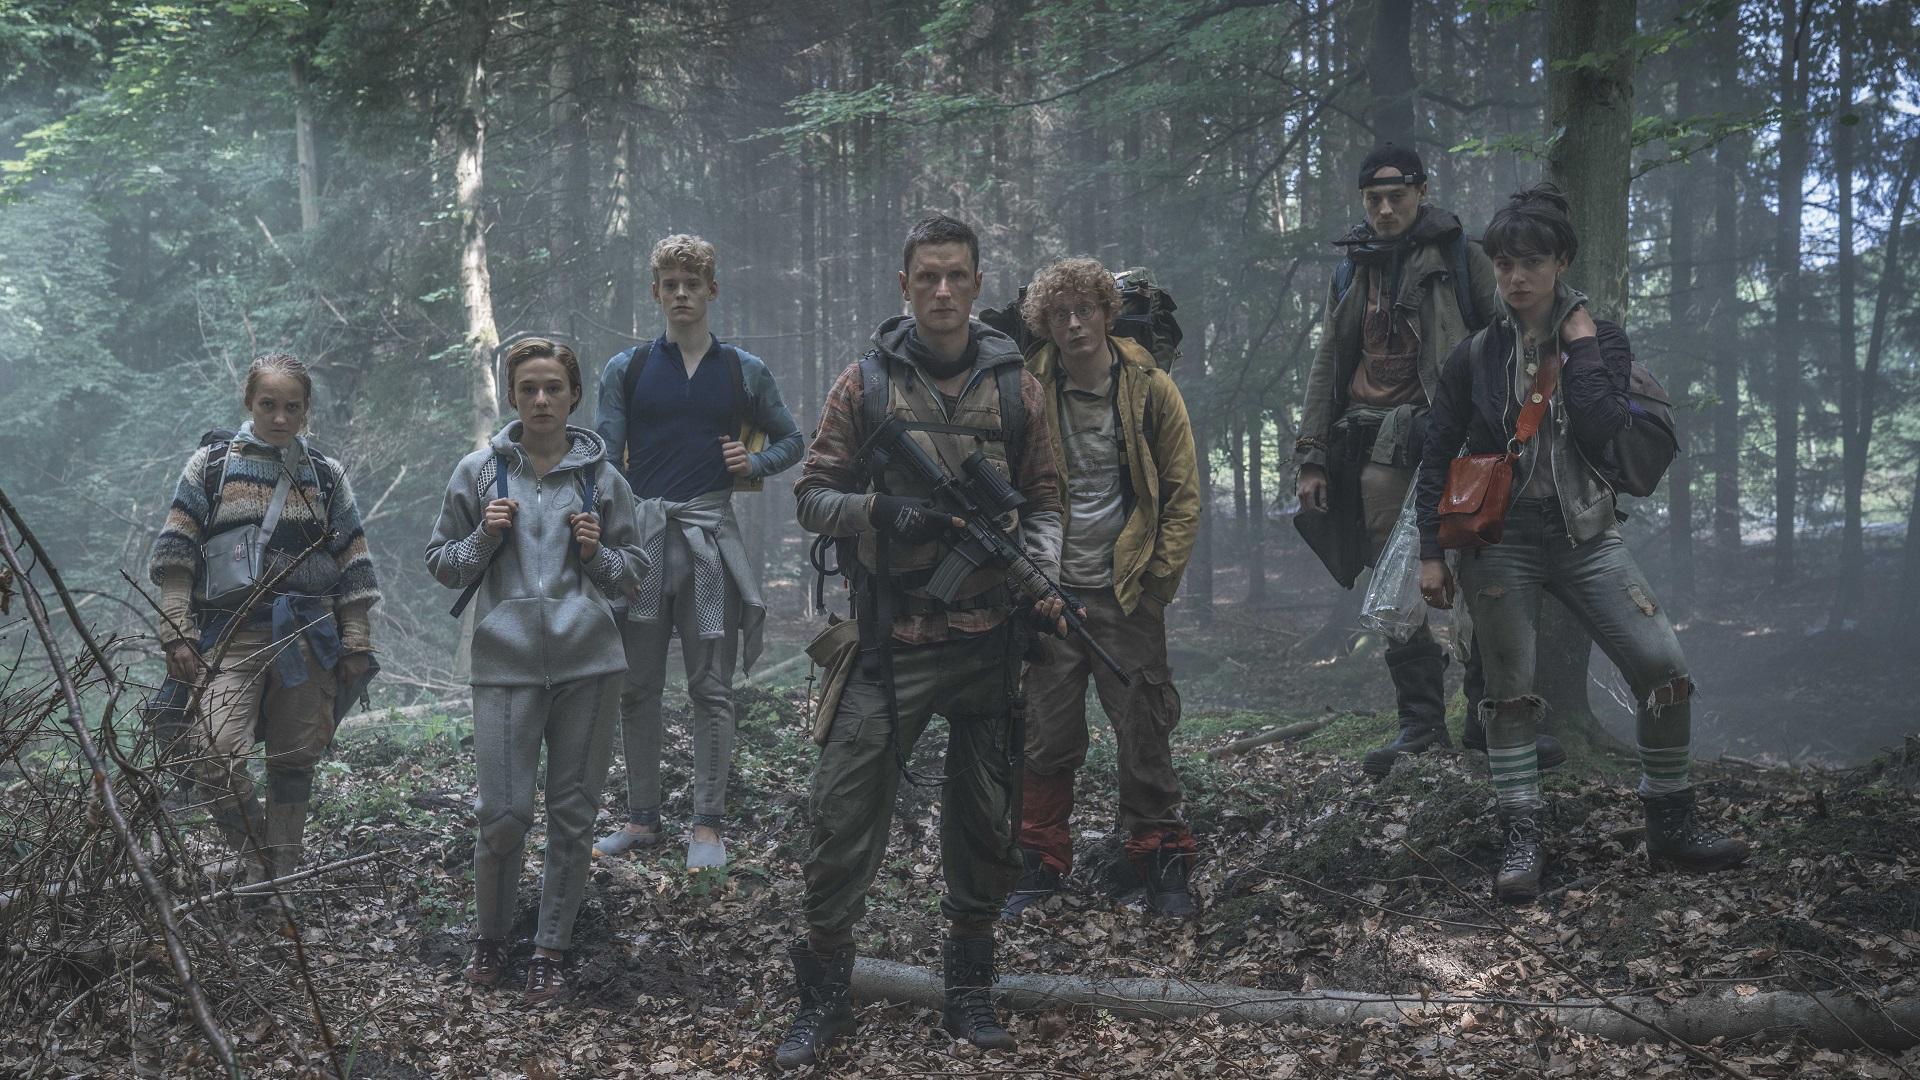 first-trailer-for-netflixs-danish-post-apocalyptic-series-the-rain-looks-interesting-social.jpg